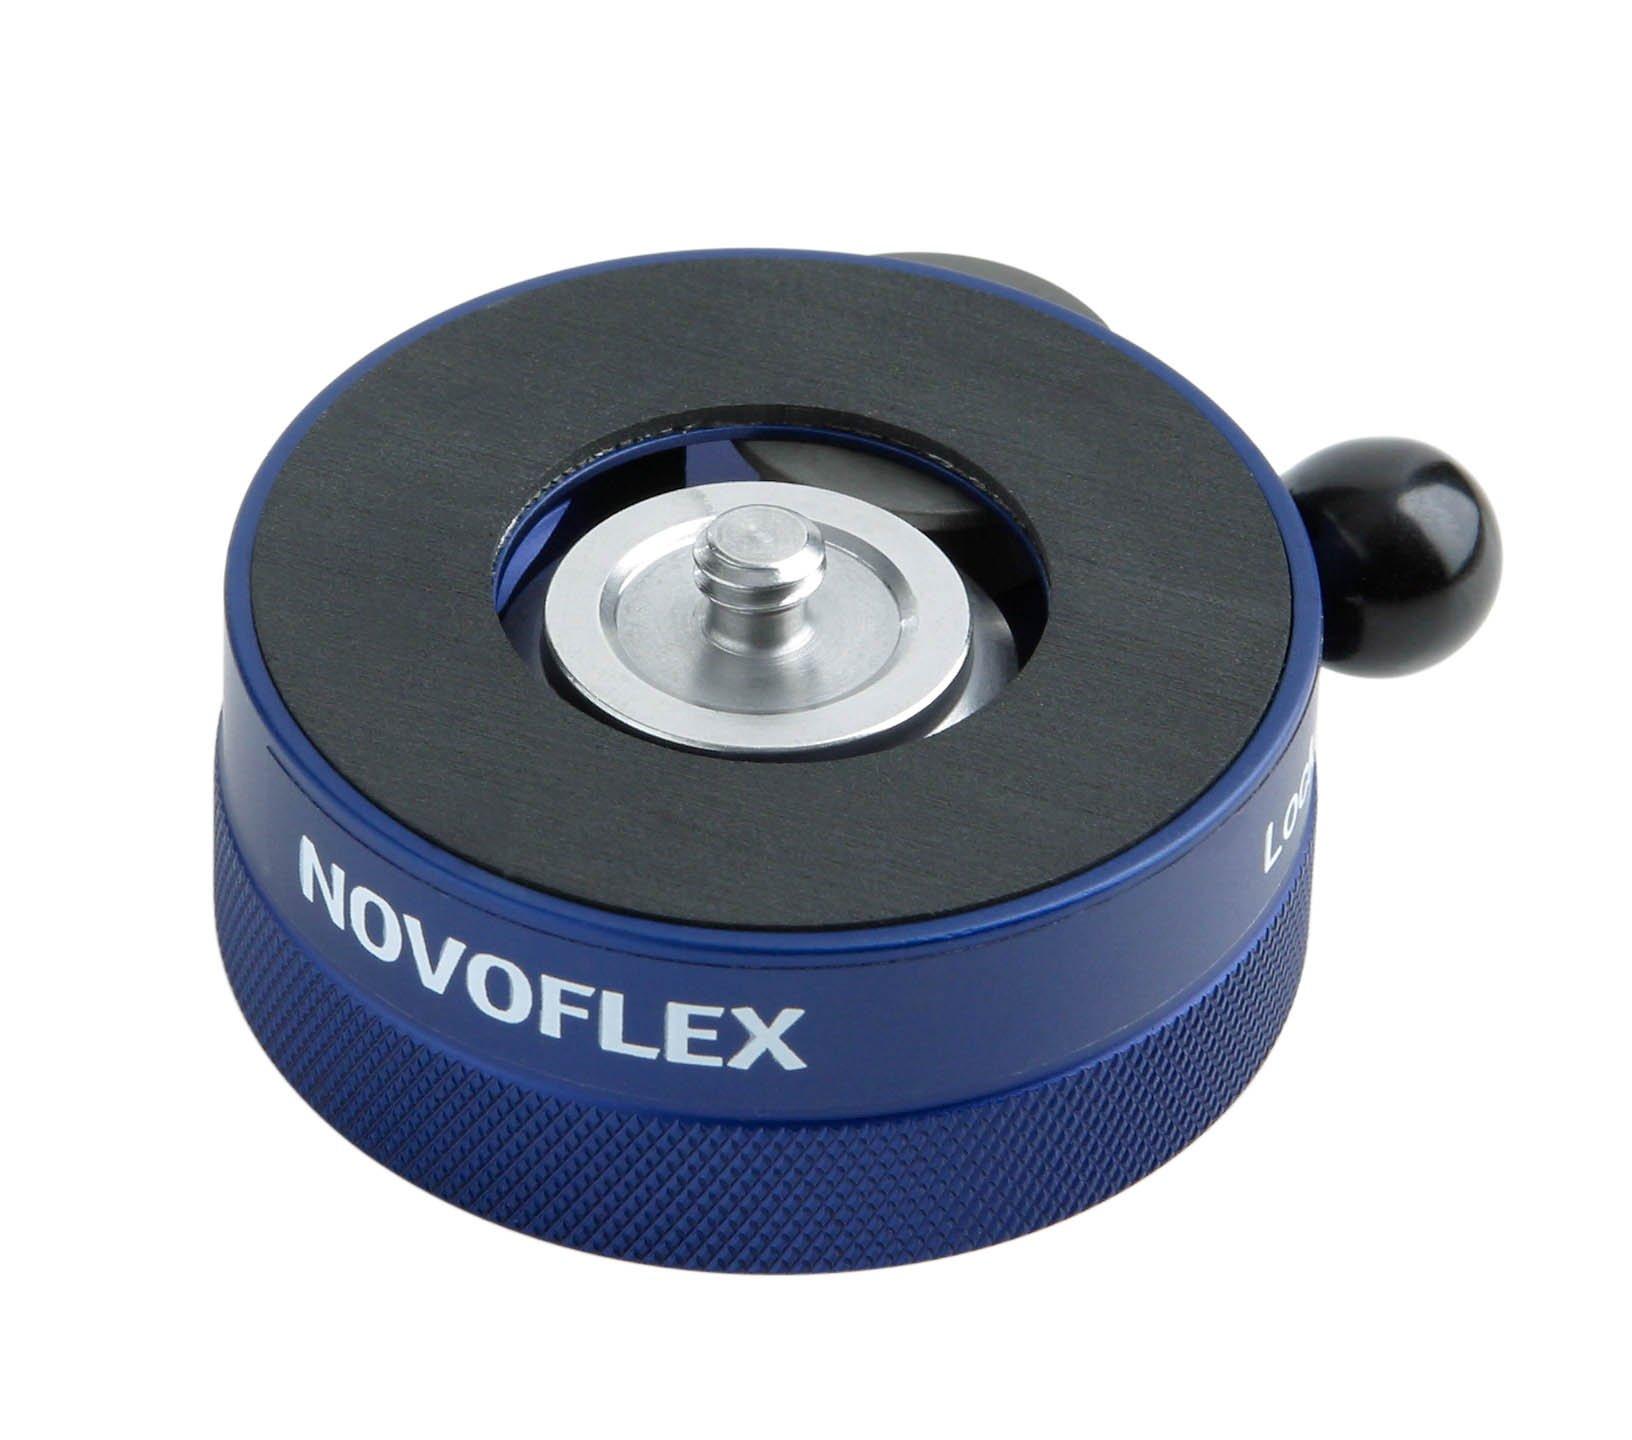 Novoflex MiniConnect MR Quick Release Base w/Plate (MC-MR)